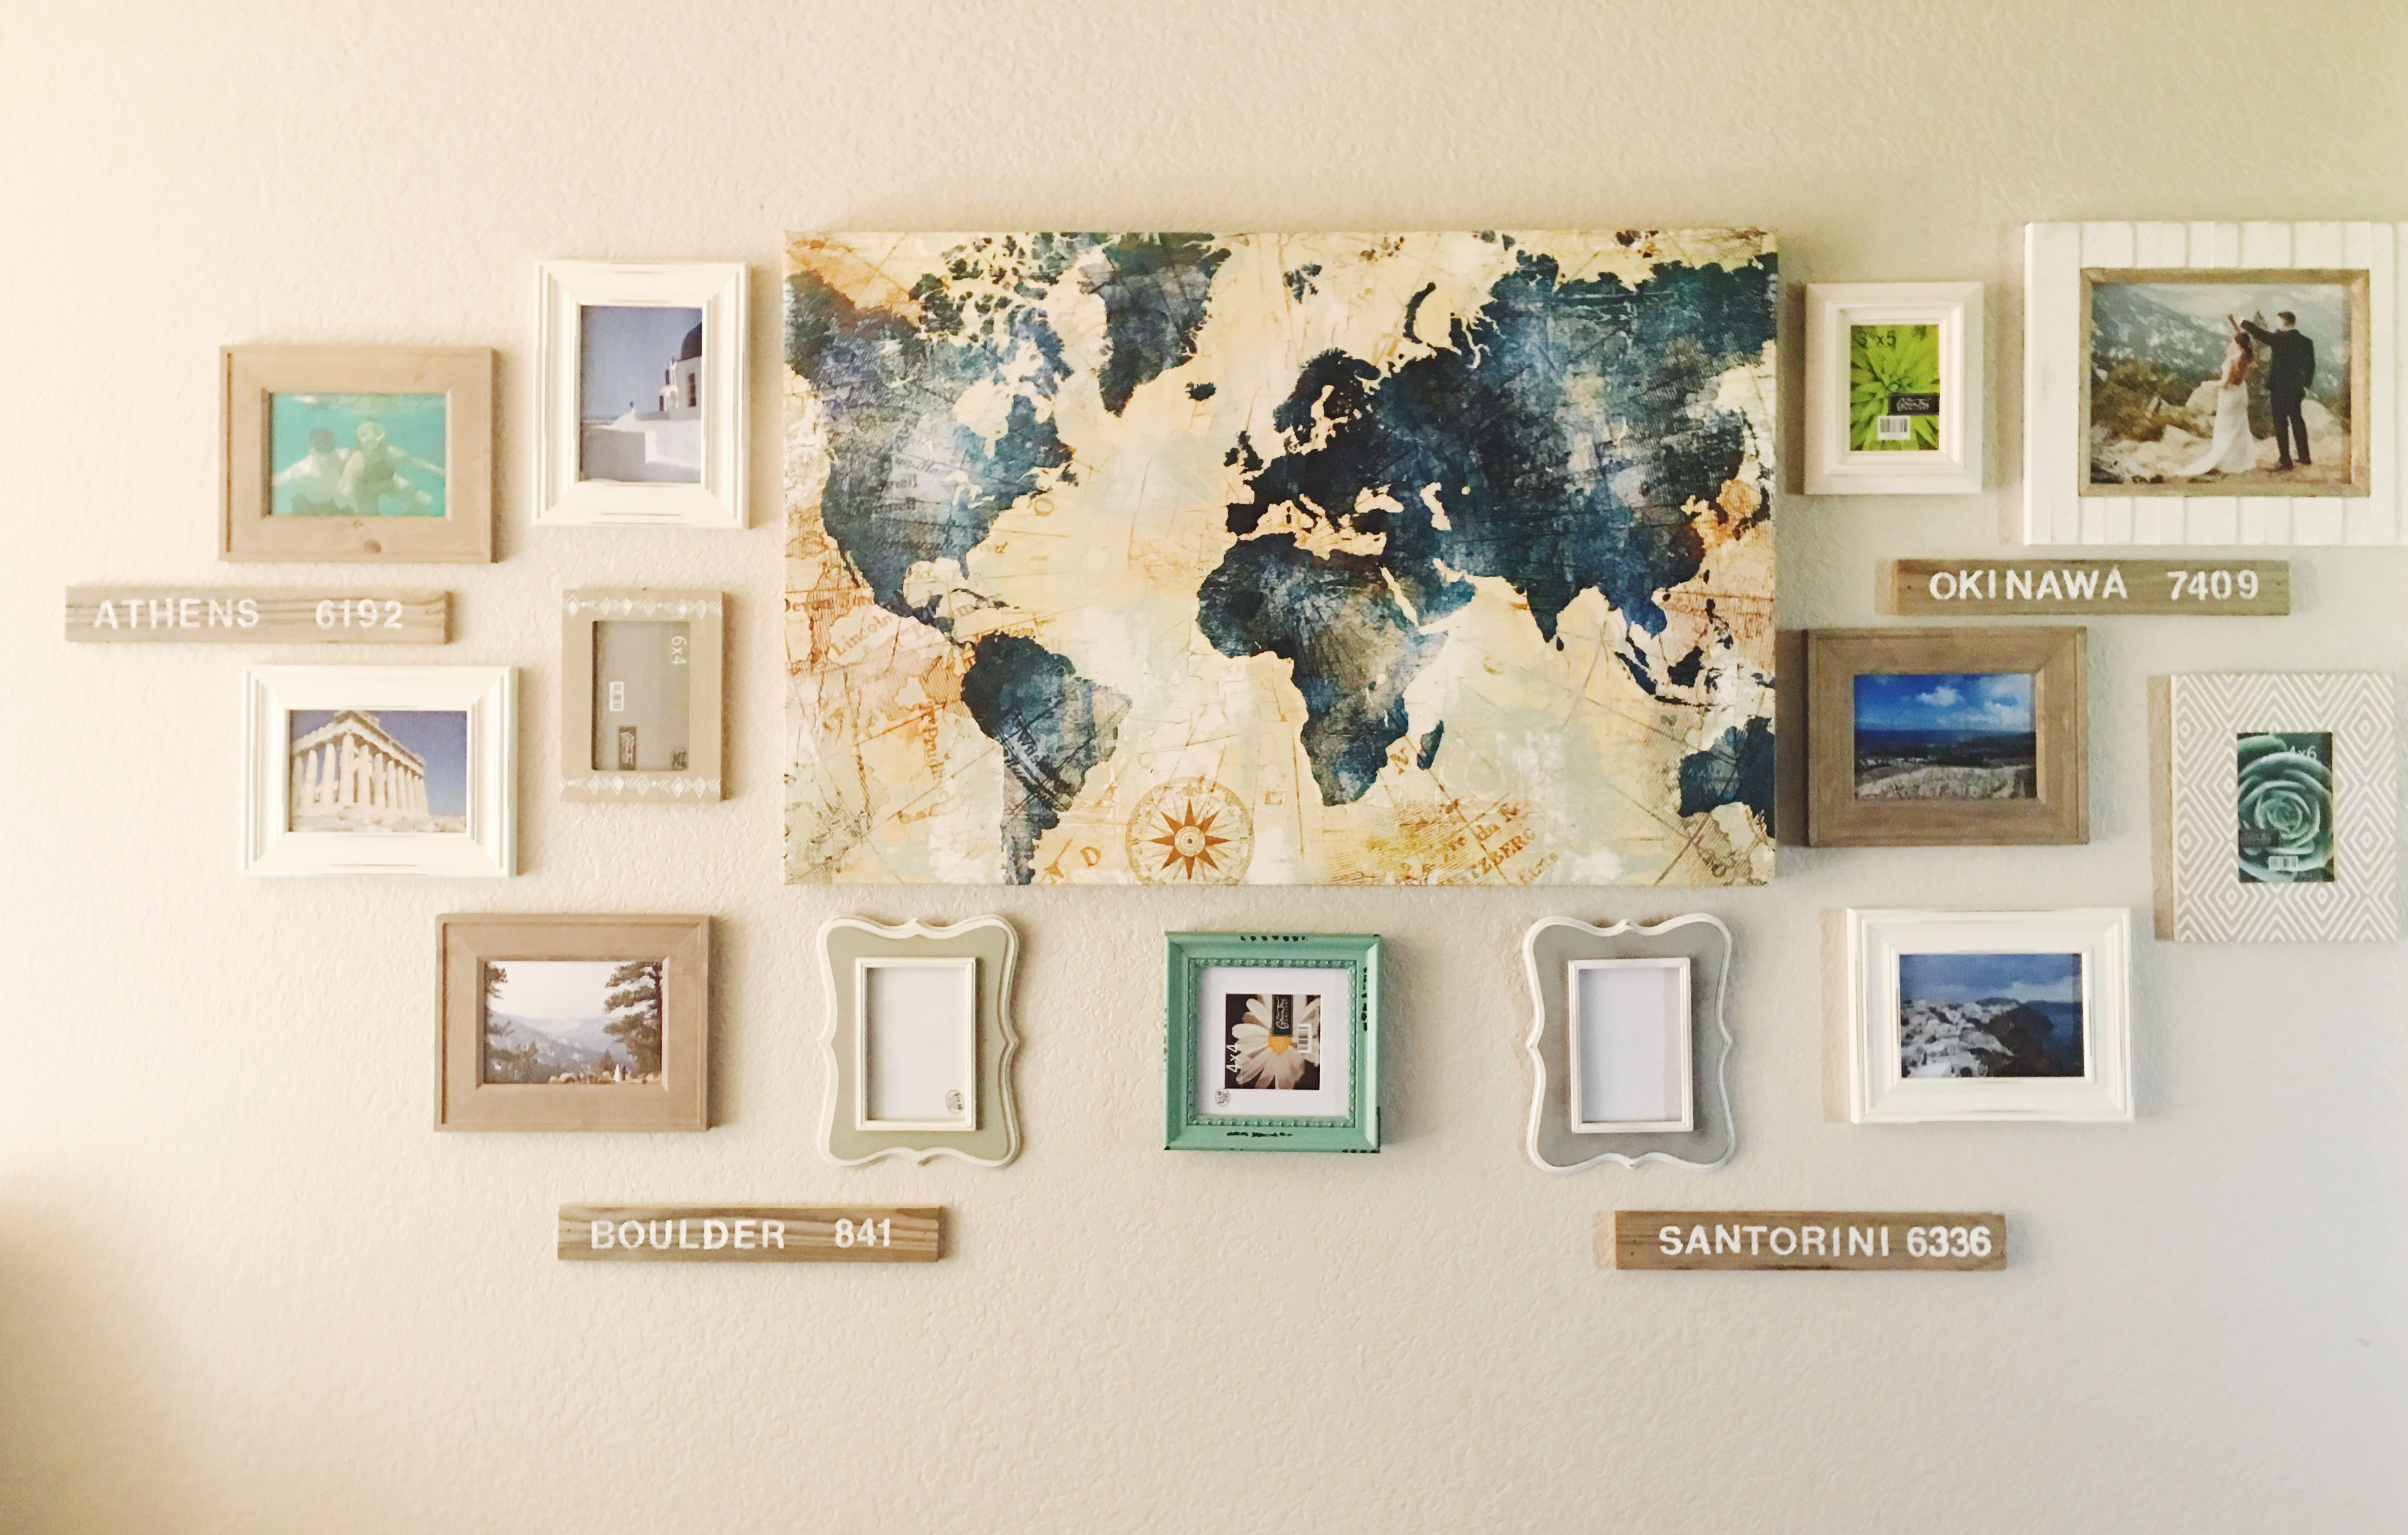 Diy Home Decor Travel Gallery Wall Adventures Explore